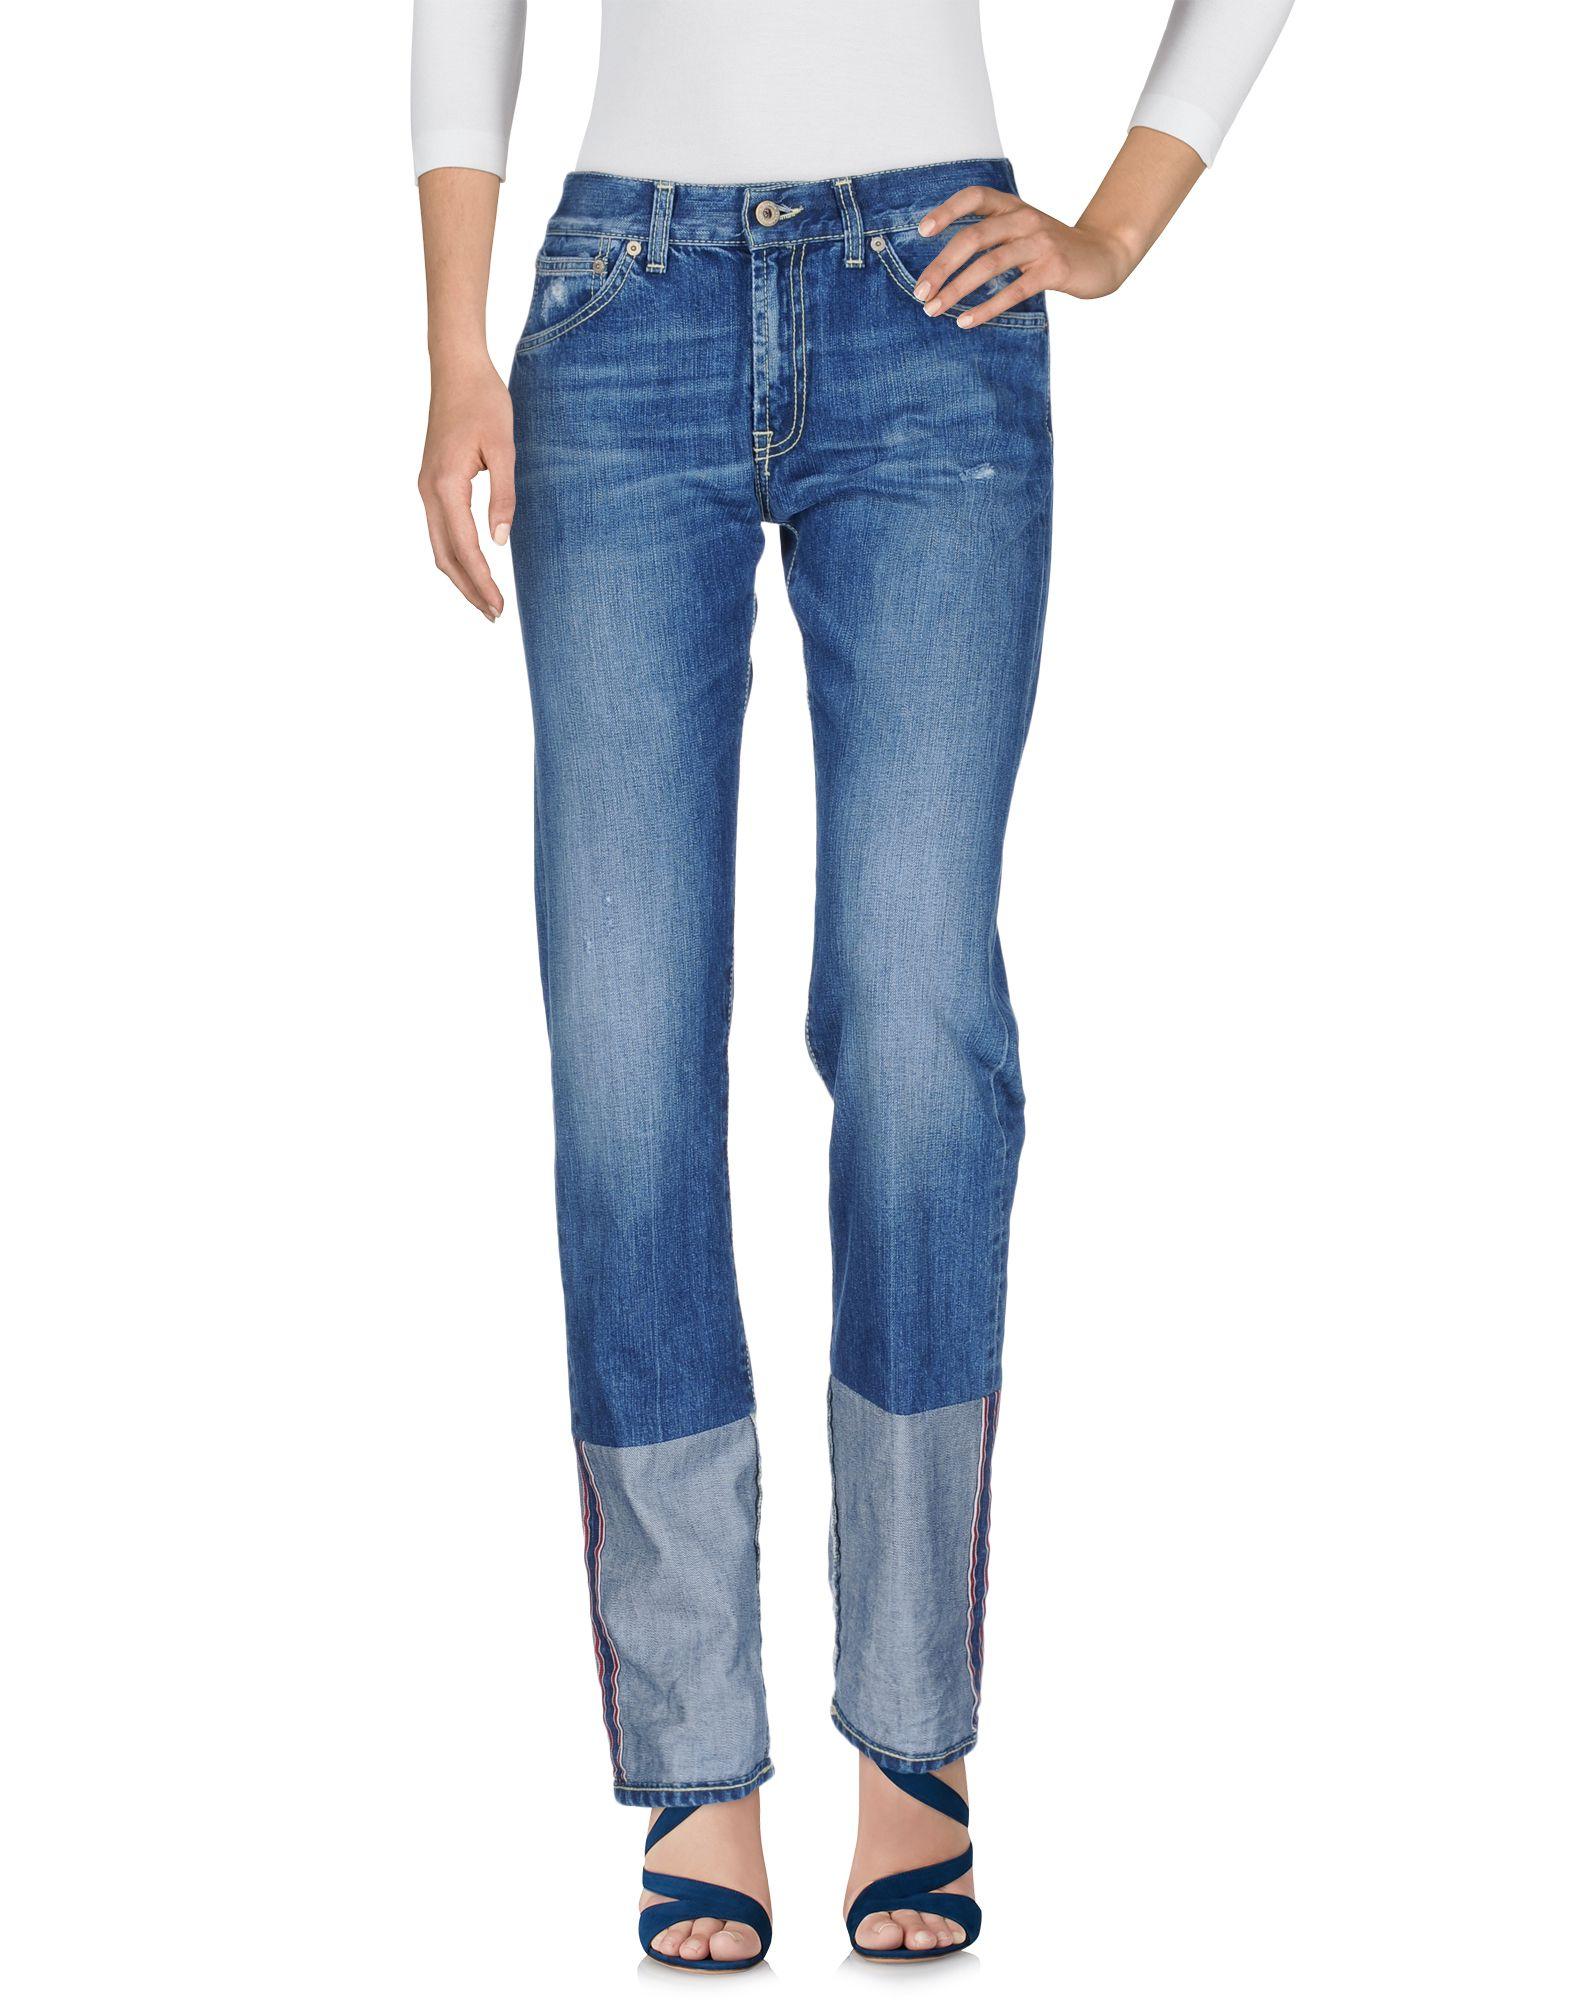 DONDUP Damen Jeanshose Farbe Blau Größe 5 - broschei